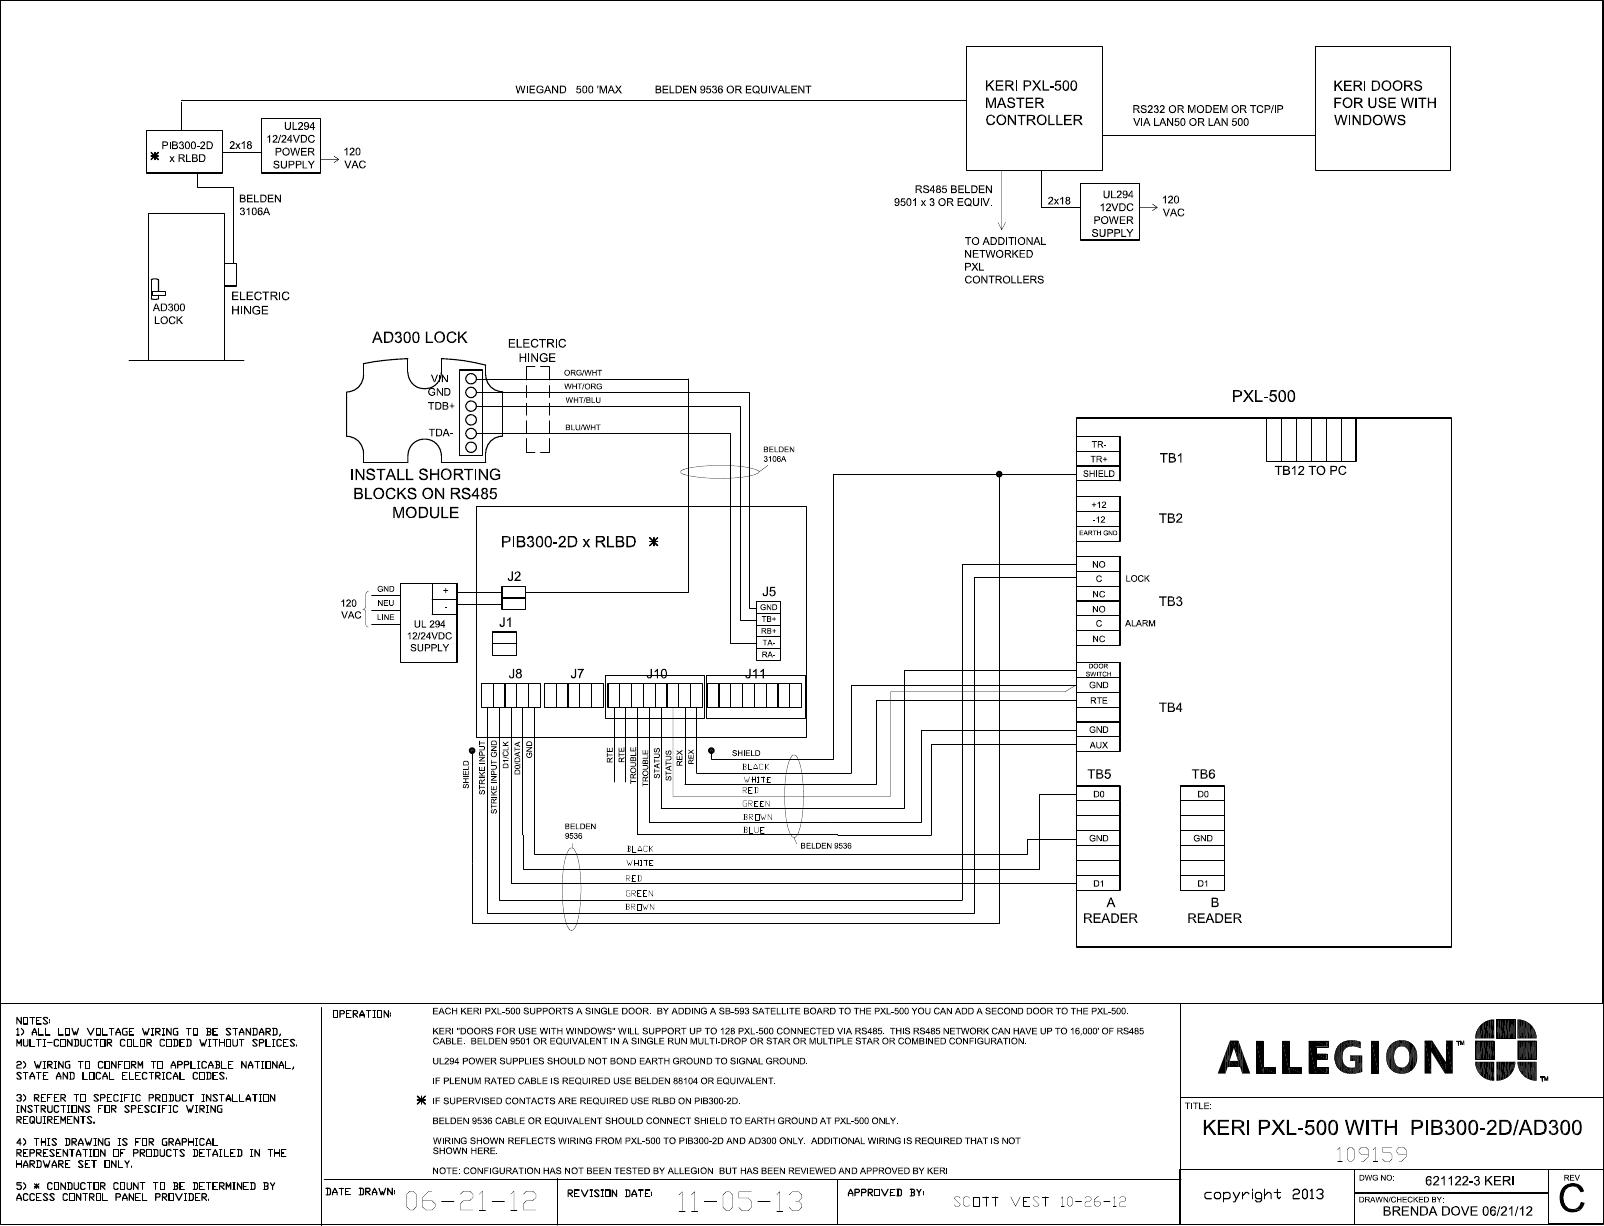 Schlage Maglock Wiring A Diagrams Securitron Diagram Electronics C Ad 400 Pim400 485 With Keri Rh Smdqueen Co M450 Locknetics M490